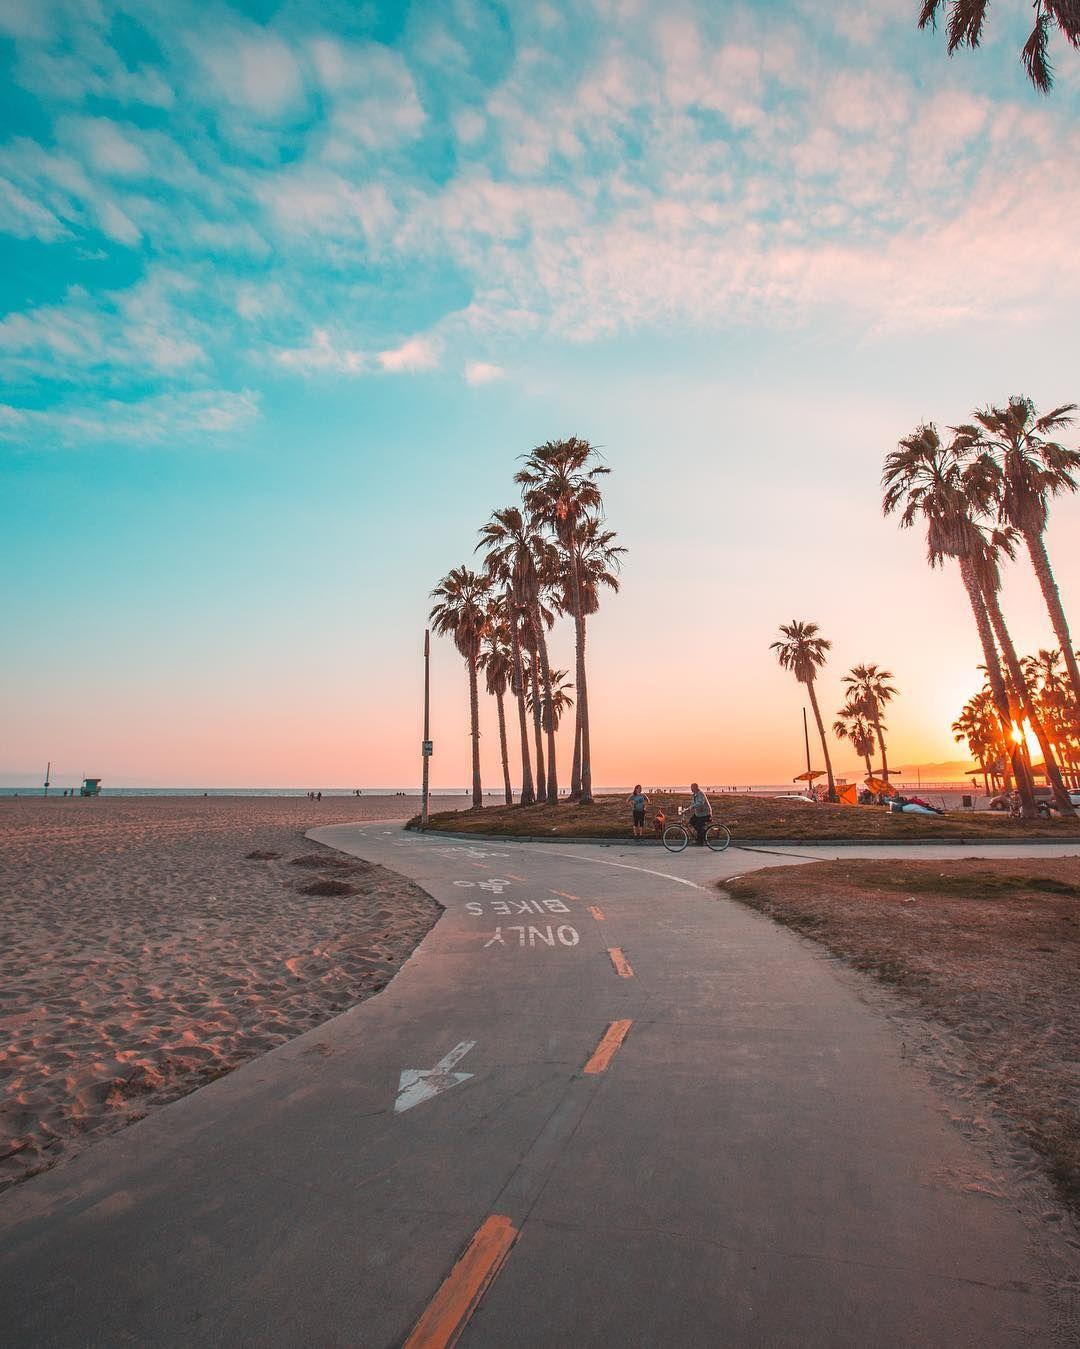 Aesthetic Los Angeles Iphone Wallpaper